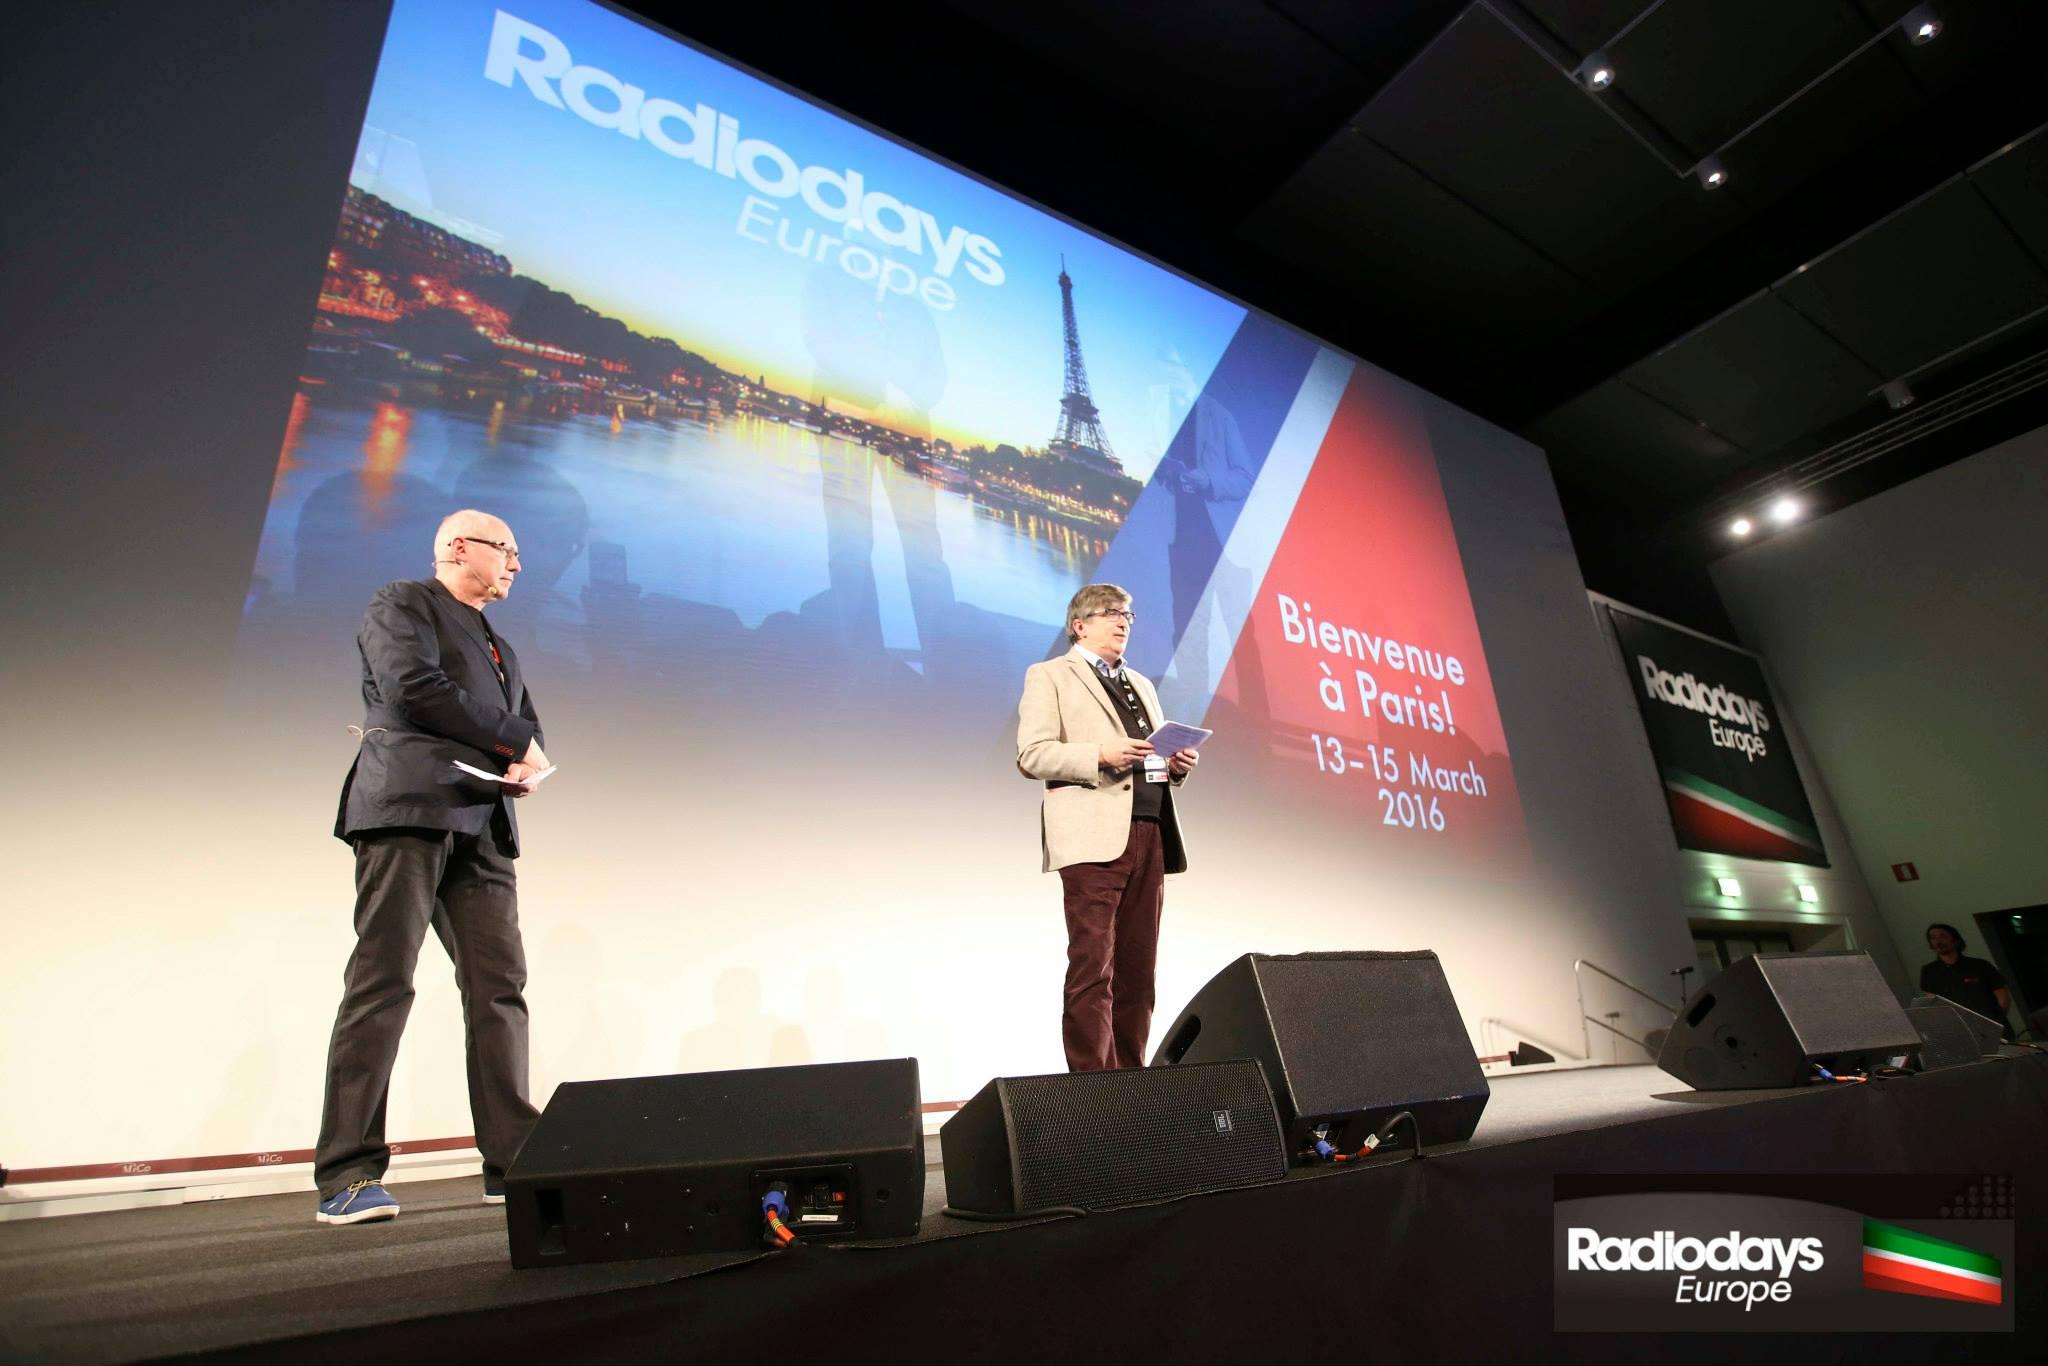 Le Suédois Anders Held et le Norvégien Rolf Brandrud : les organisateurs des Radiodays Europe